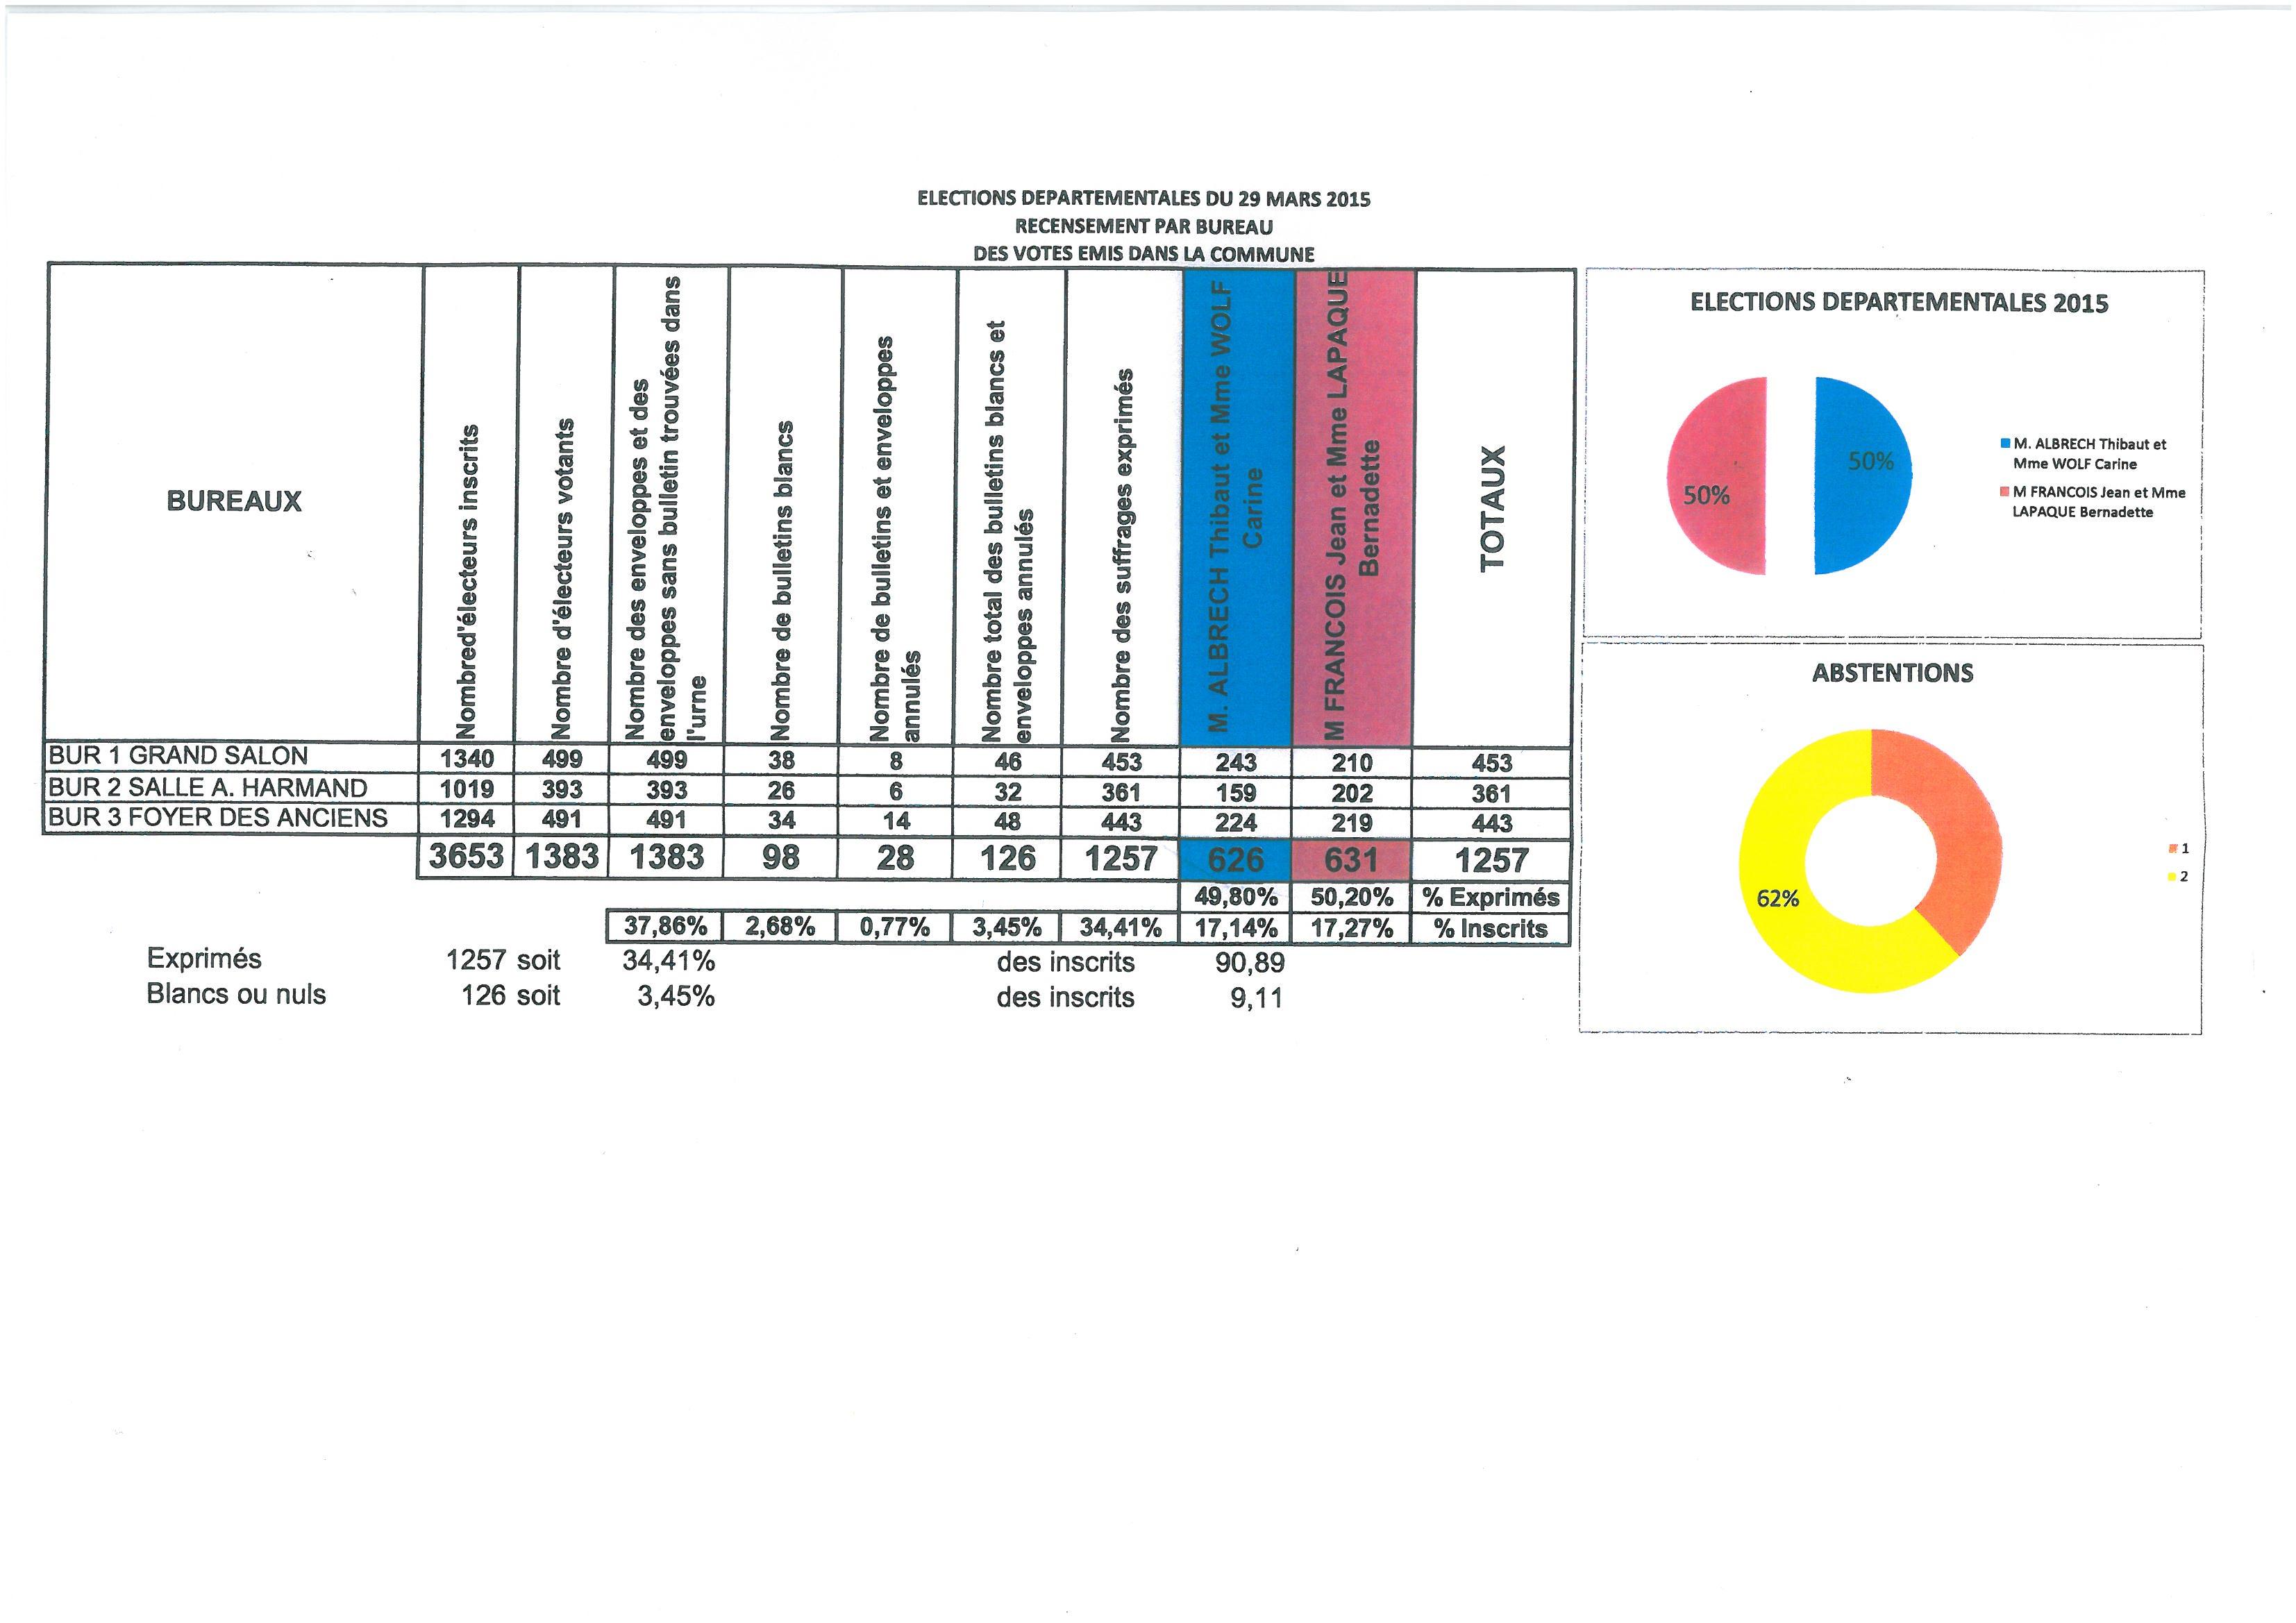 RESULTATS DES ELECTIONS DEPARTEMENTALES du 29 mars 2015